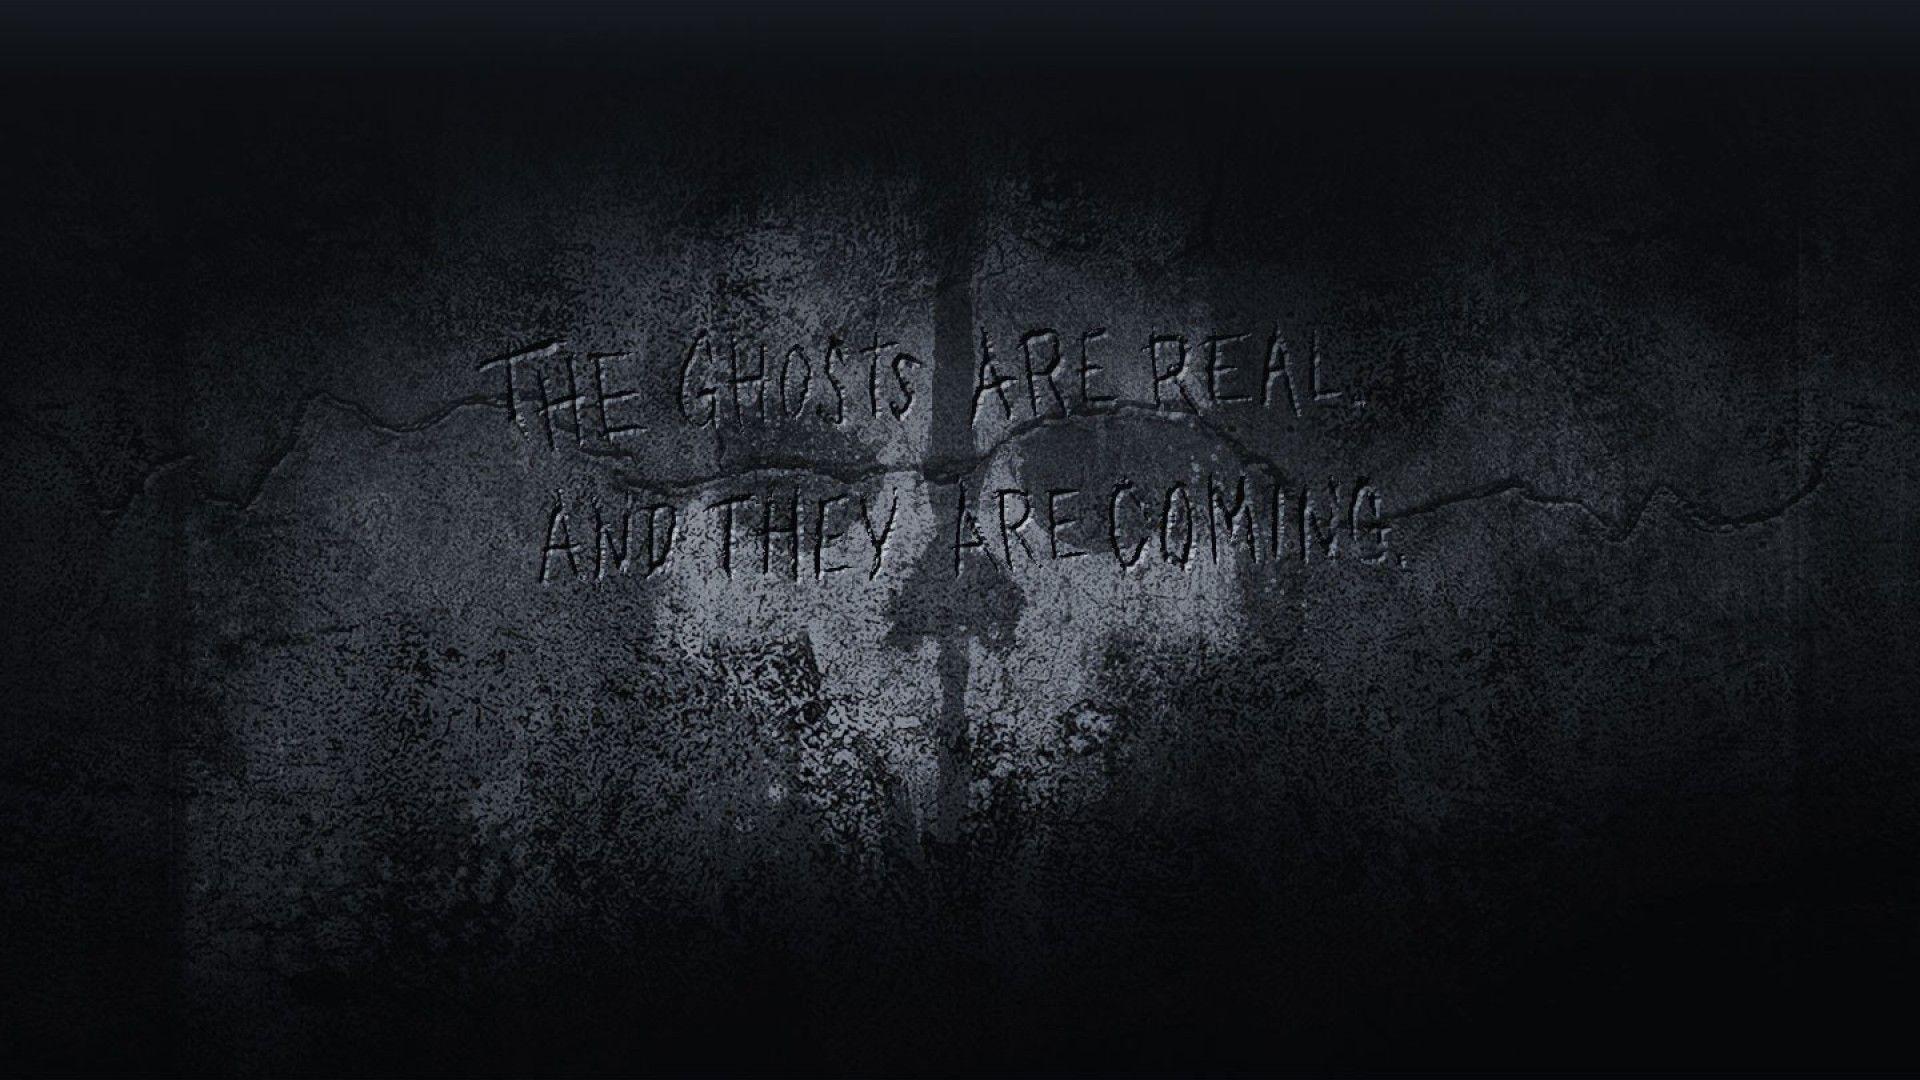 Ghost Computer Wallpapers, Desktop Backgrounds ID: 1920x1080